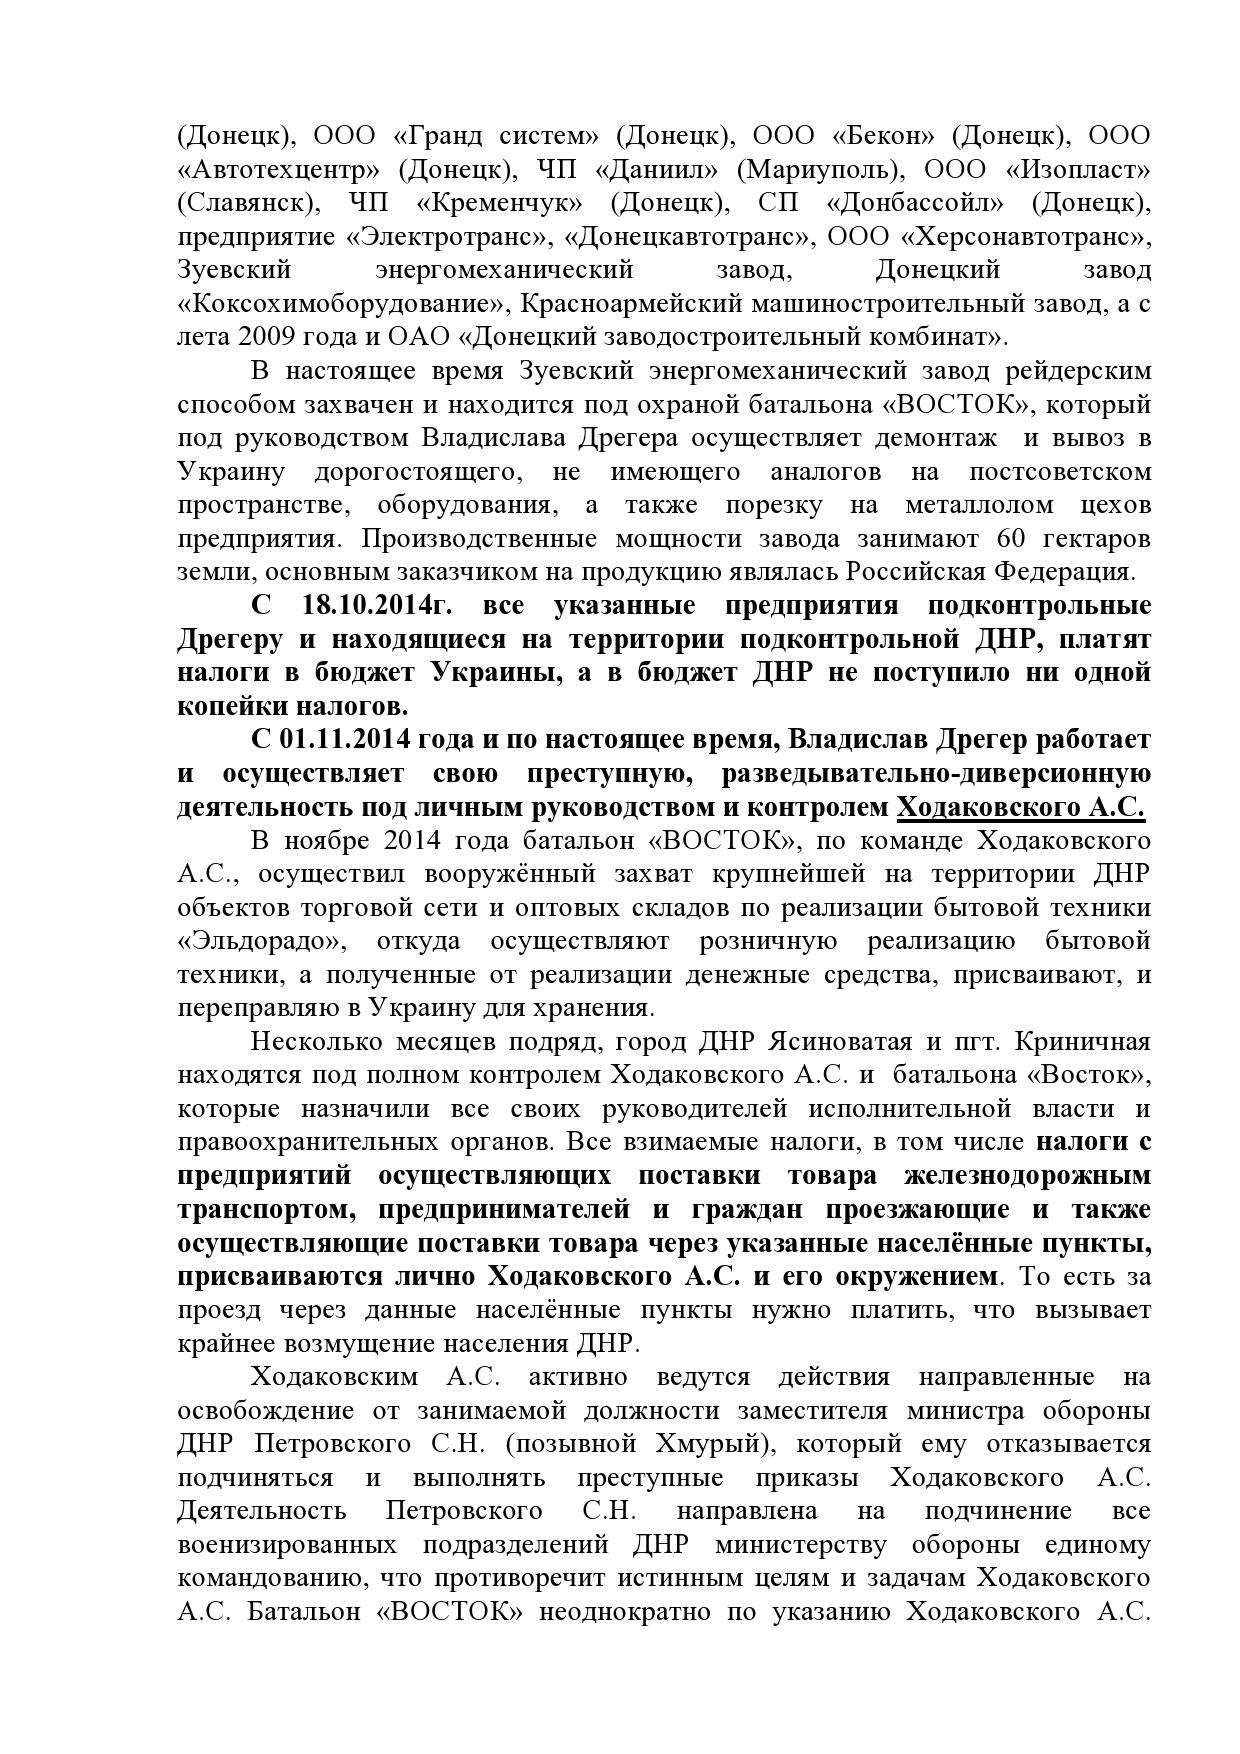 https://b0ltai.files.wordpress.com/2015/09/page0006.jpg